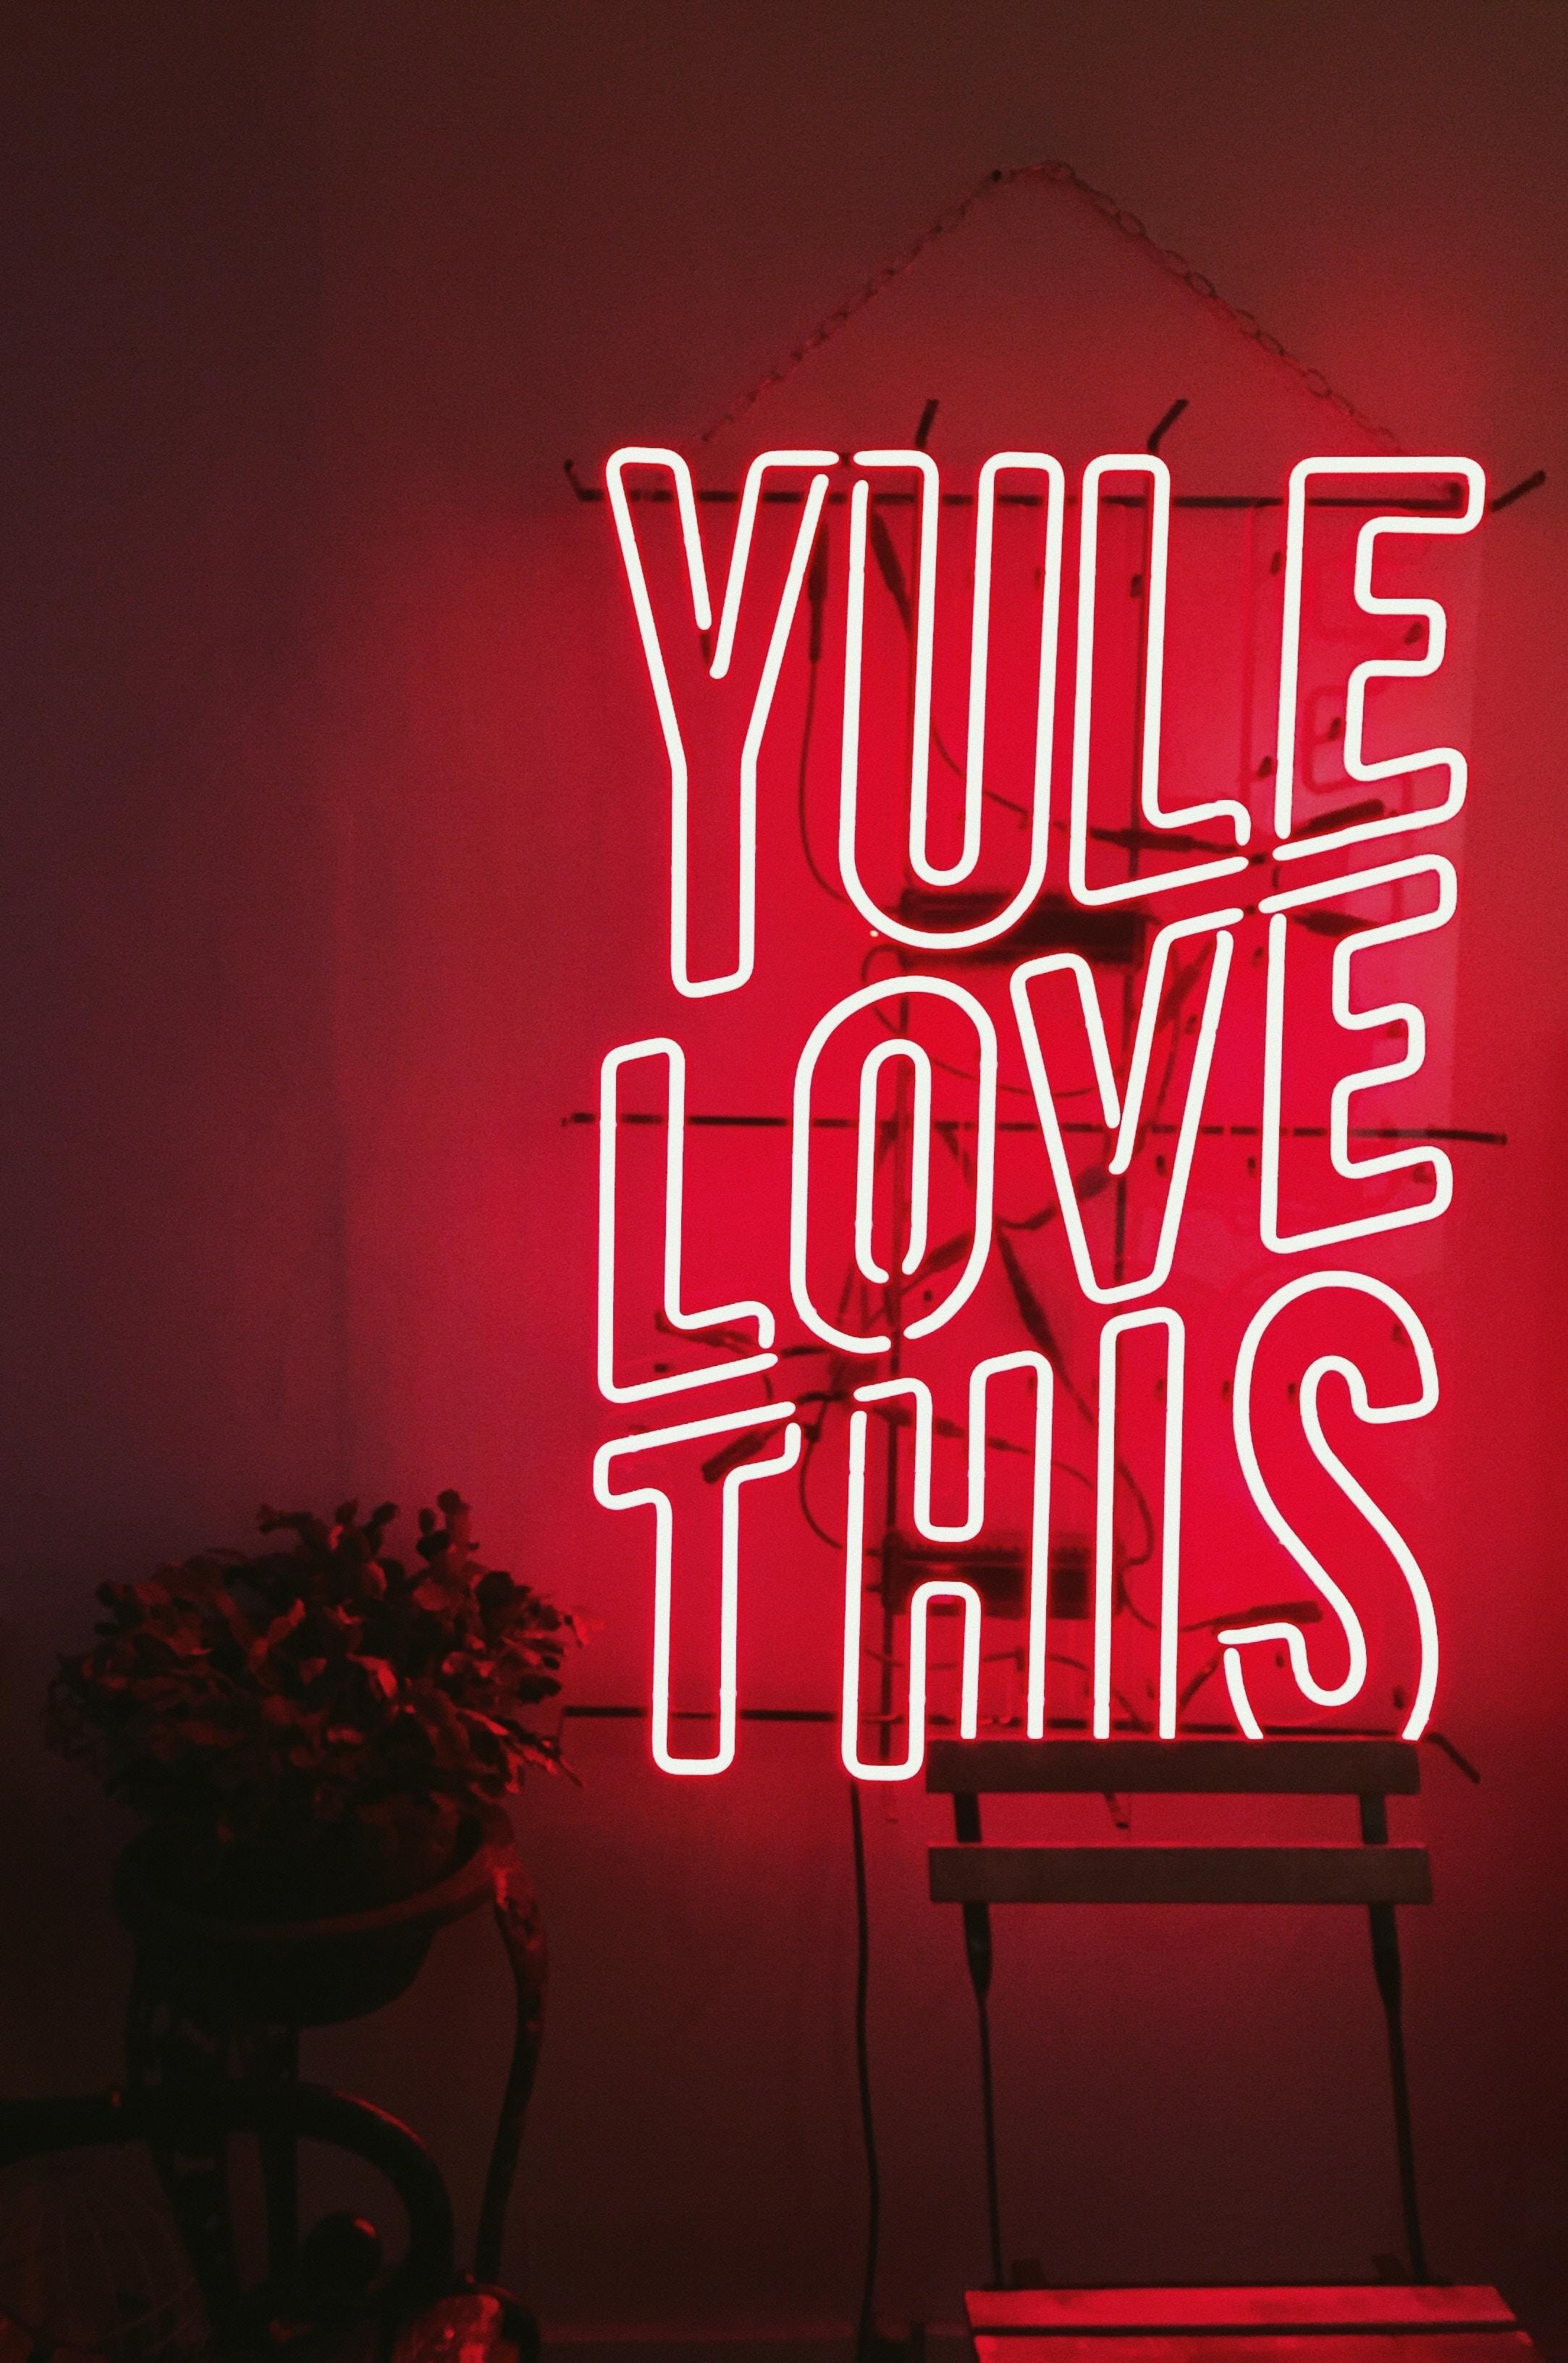 yule love this LED signage